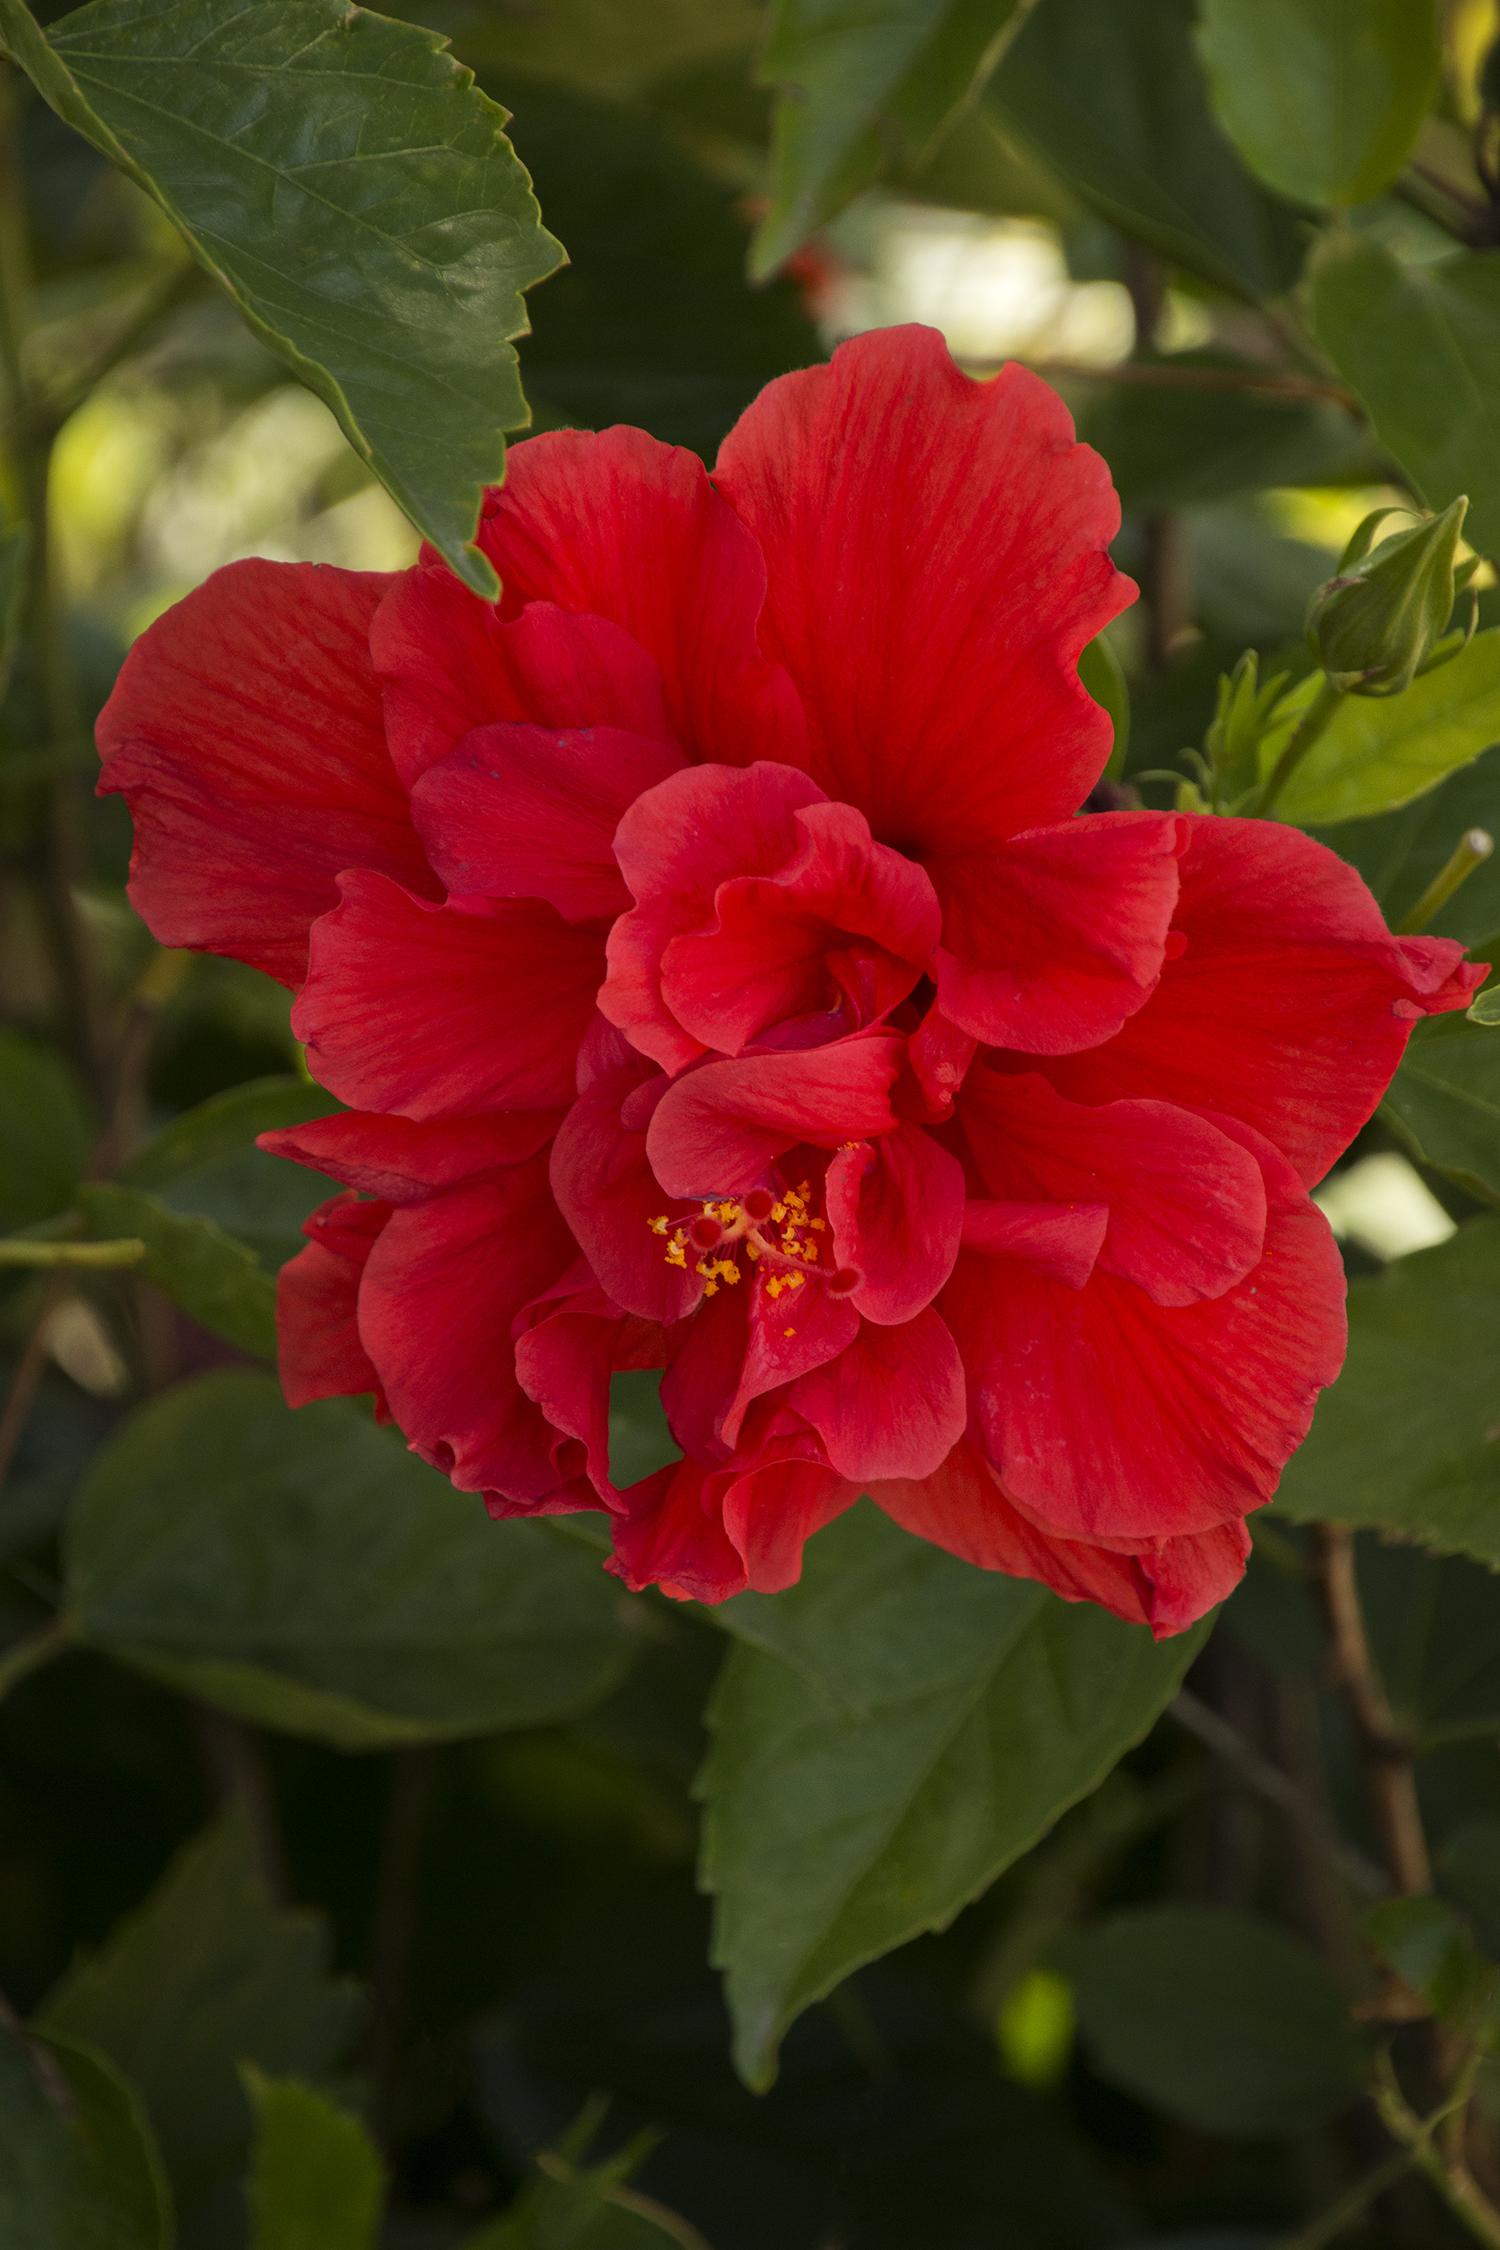 Red Dragon® Hibiscus - Monrovia - Red Dragon® Hibiscus